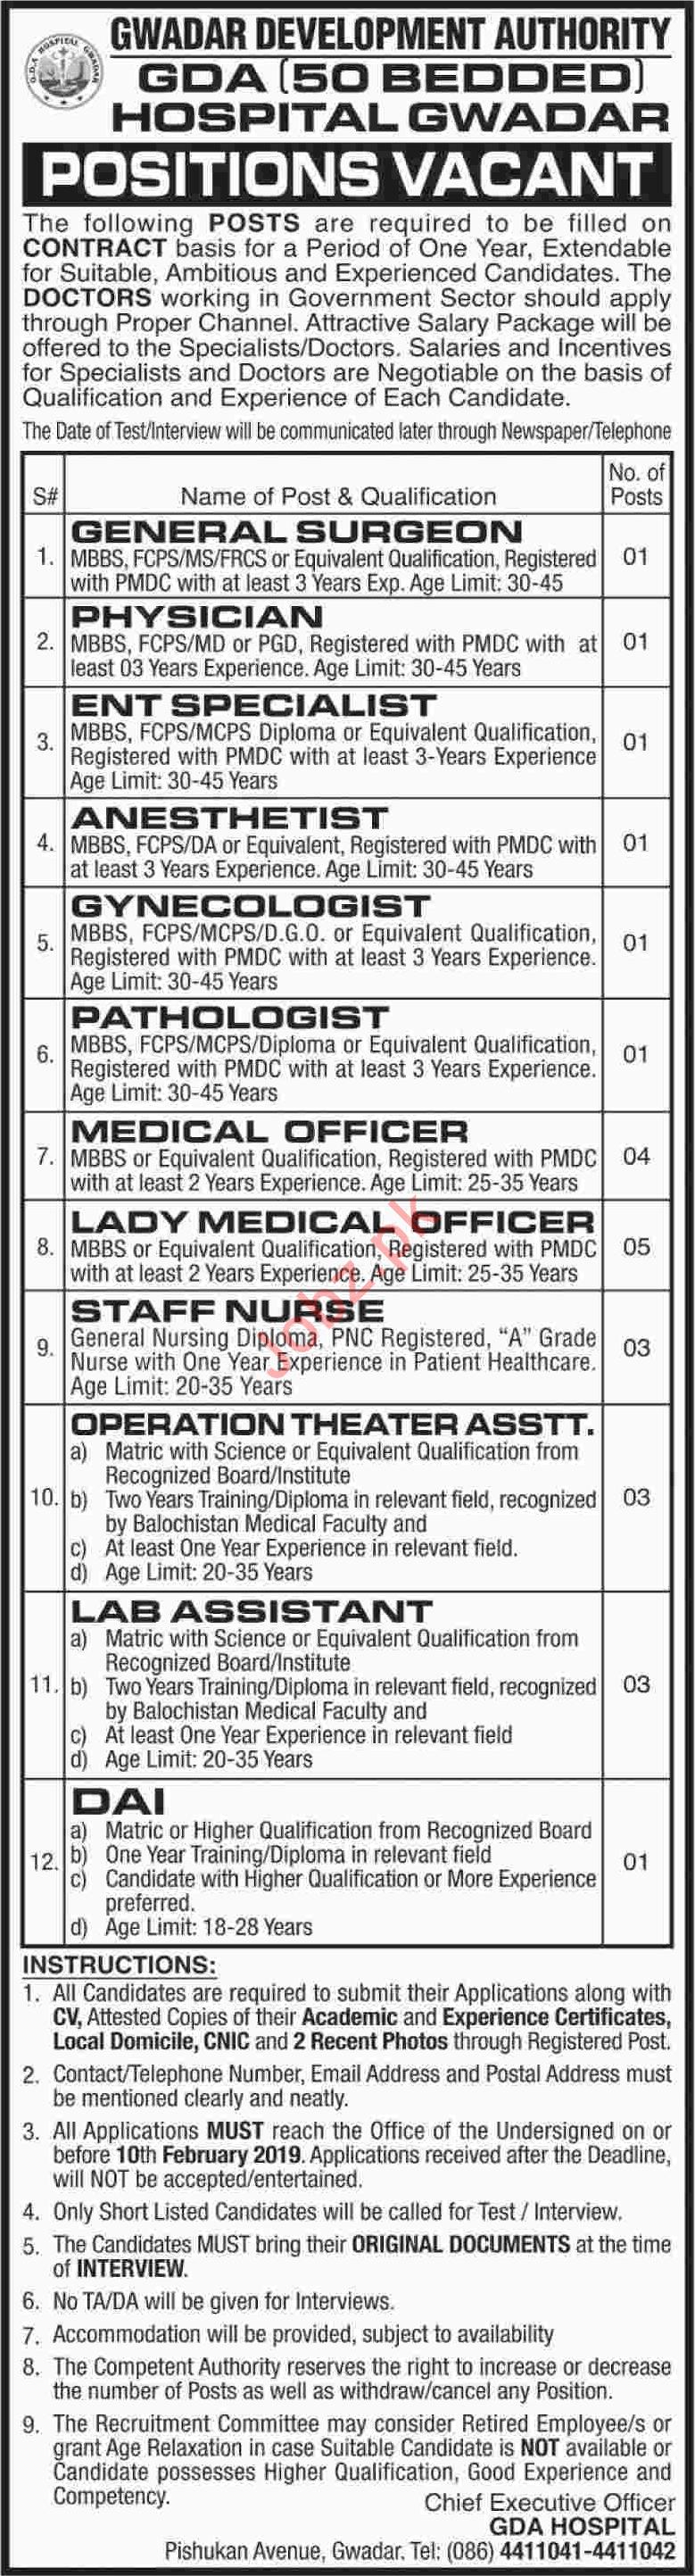 Gwadar Development Authority GDA Hospital Jobs 2019